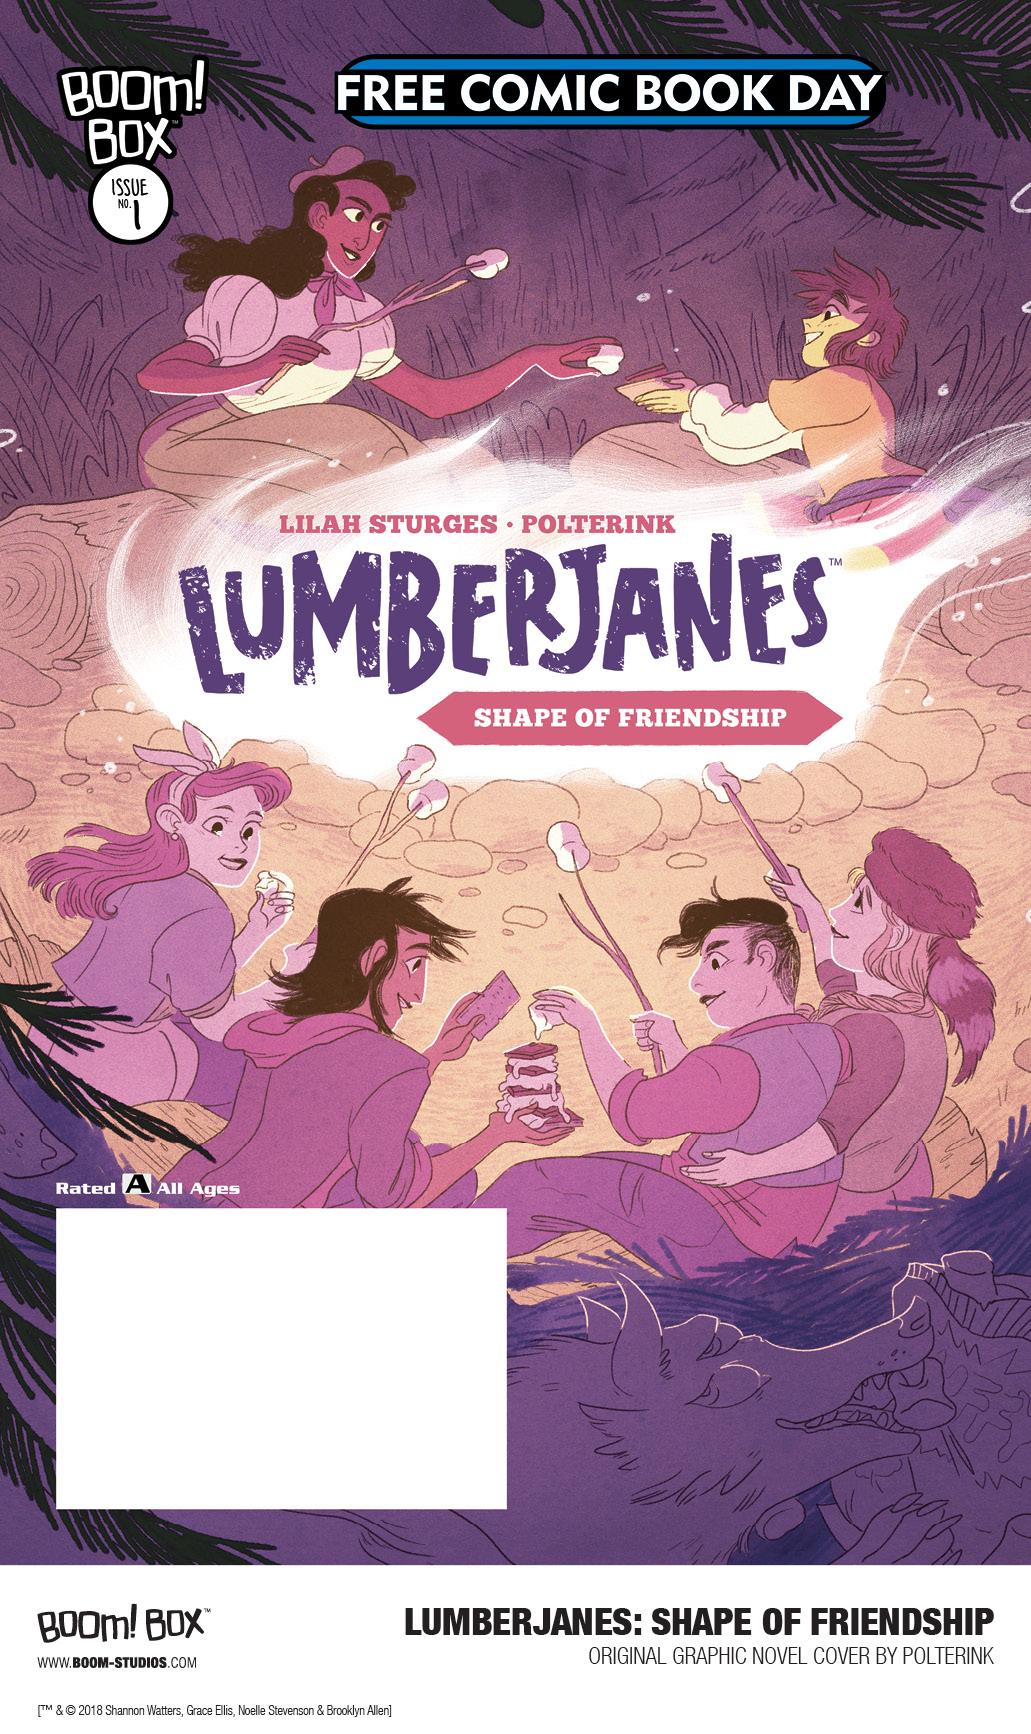 Lumberjanes - Shape of friendship FCBD